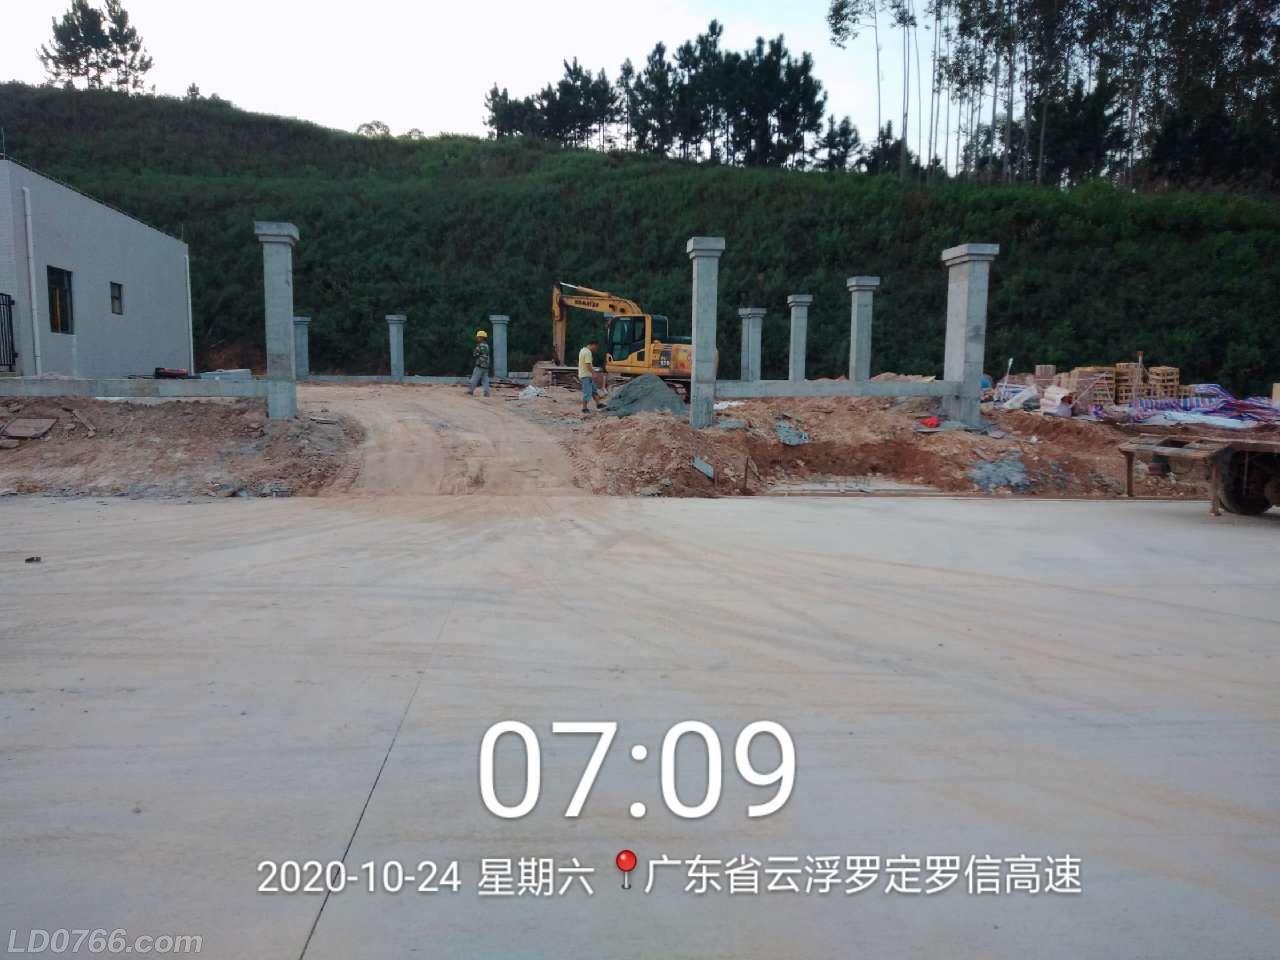 front2_0_Fu6X5__meHiykkSwLgXJUqp364Zk.1603496878.jpg